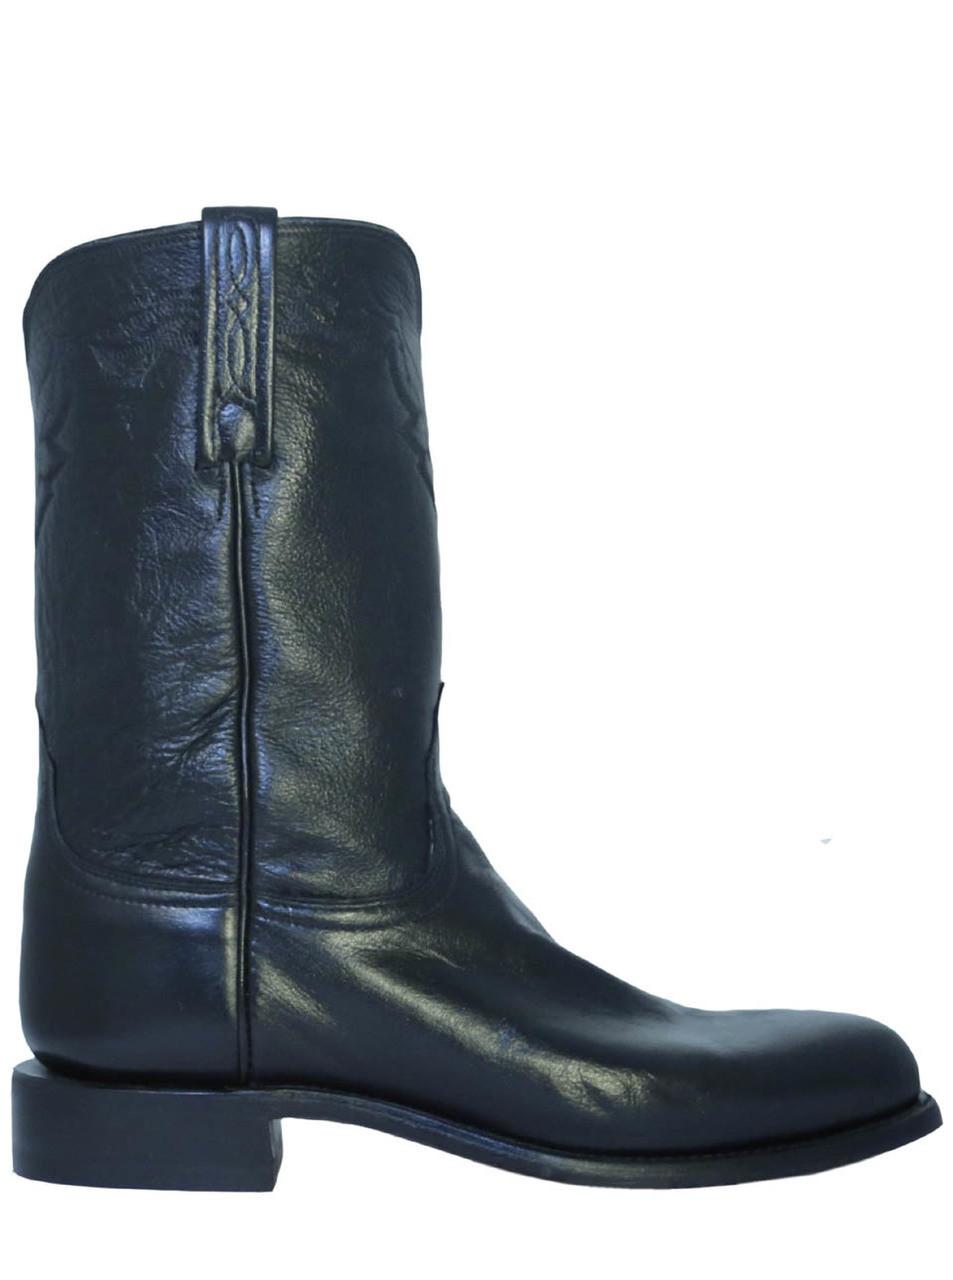 0dbf32a1c1c Lucchese T0082 Men's Leather Roper Cowboy Boots Short Shaft Black